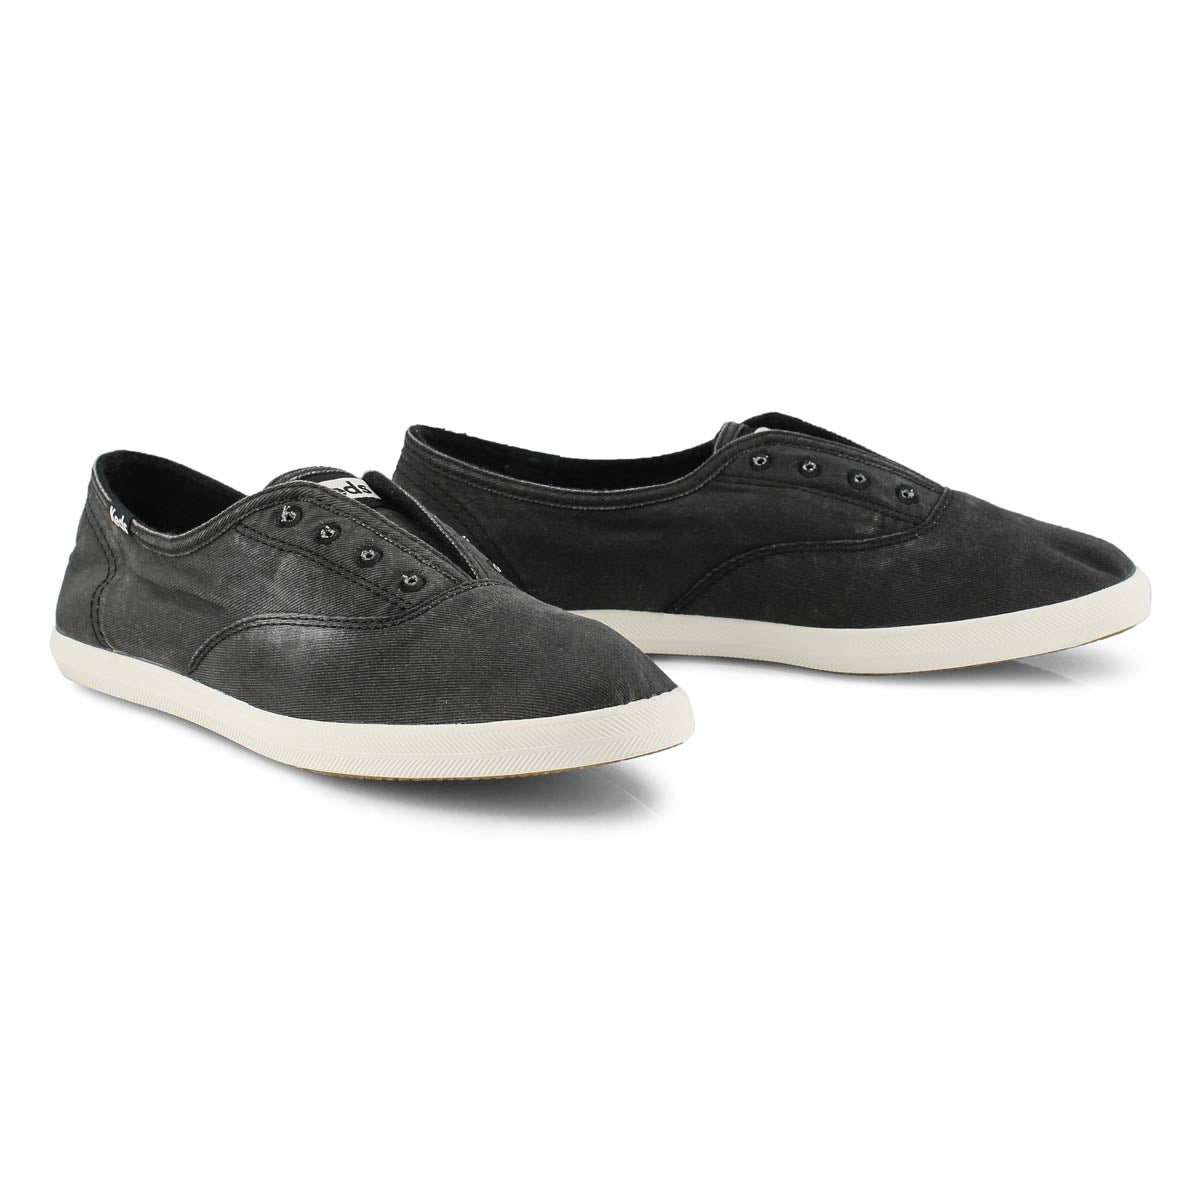 Lds Chillax charcoal fashion sneaker